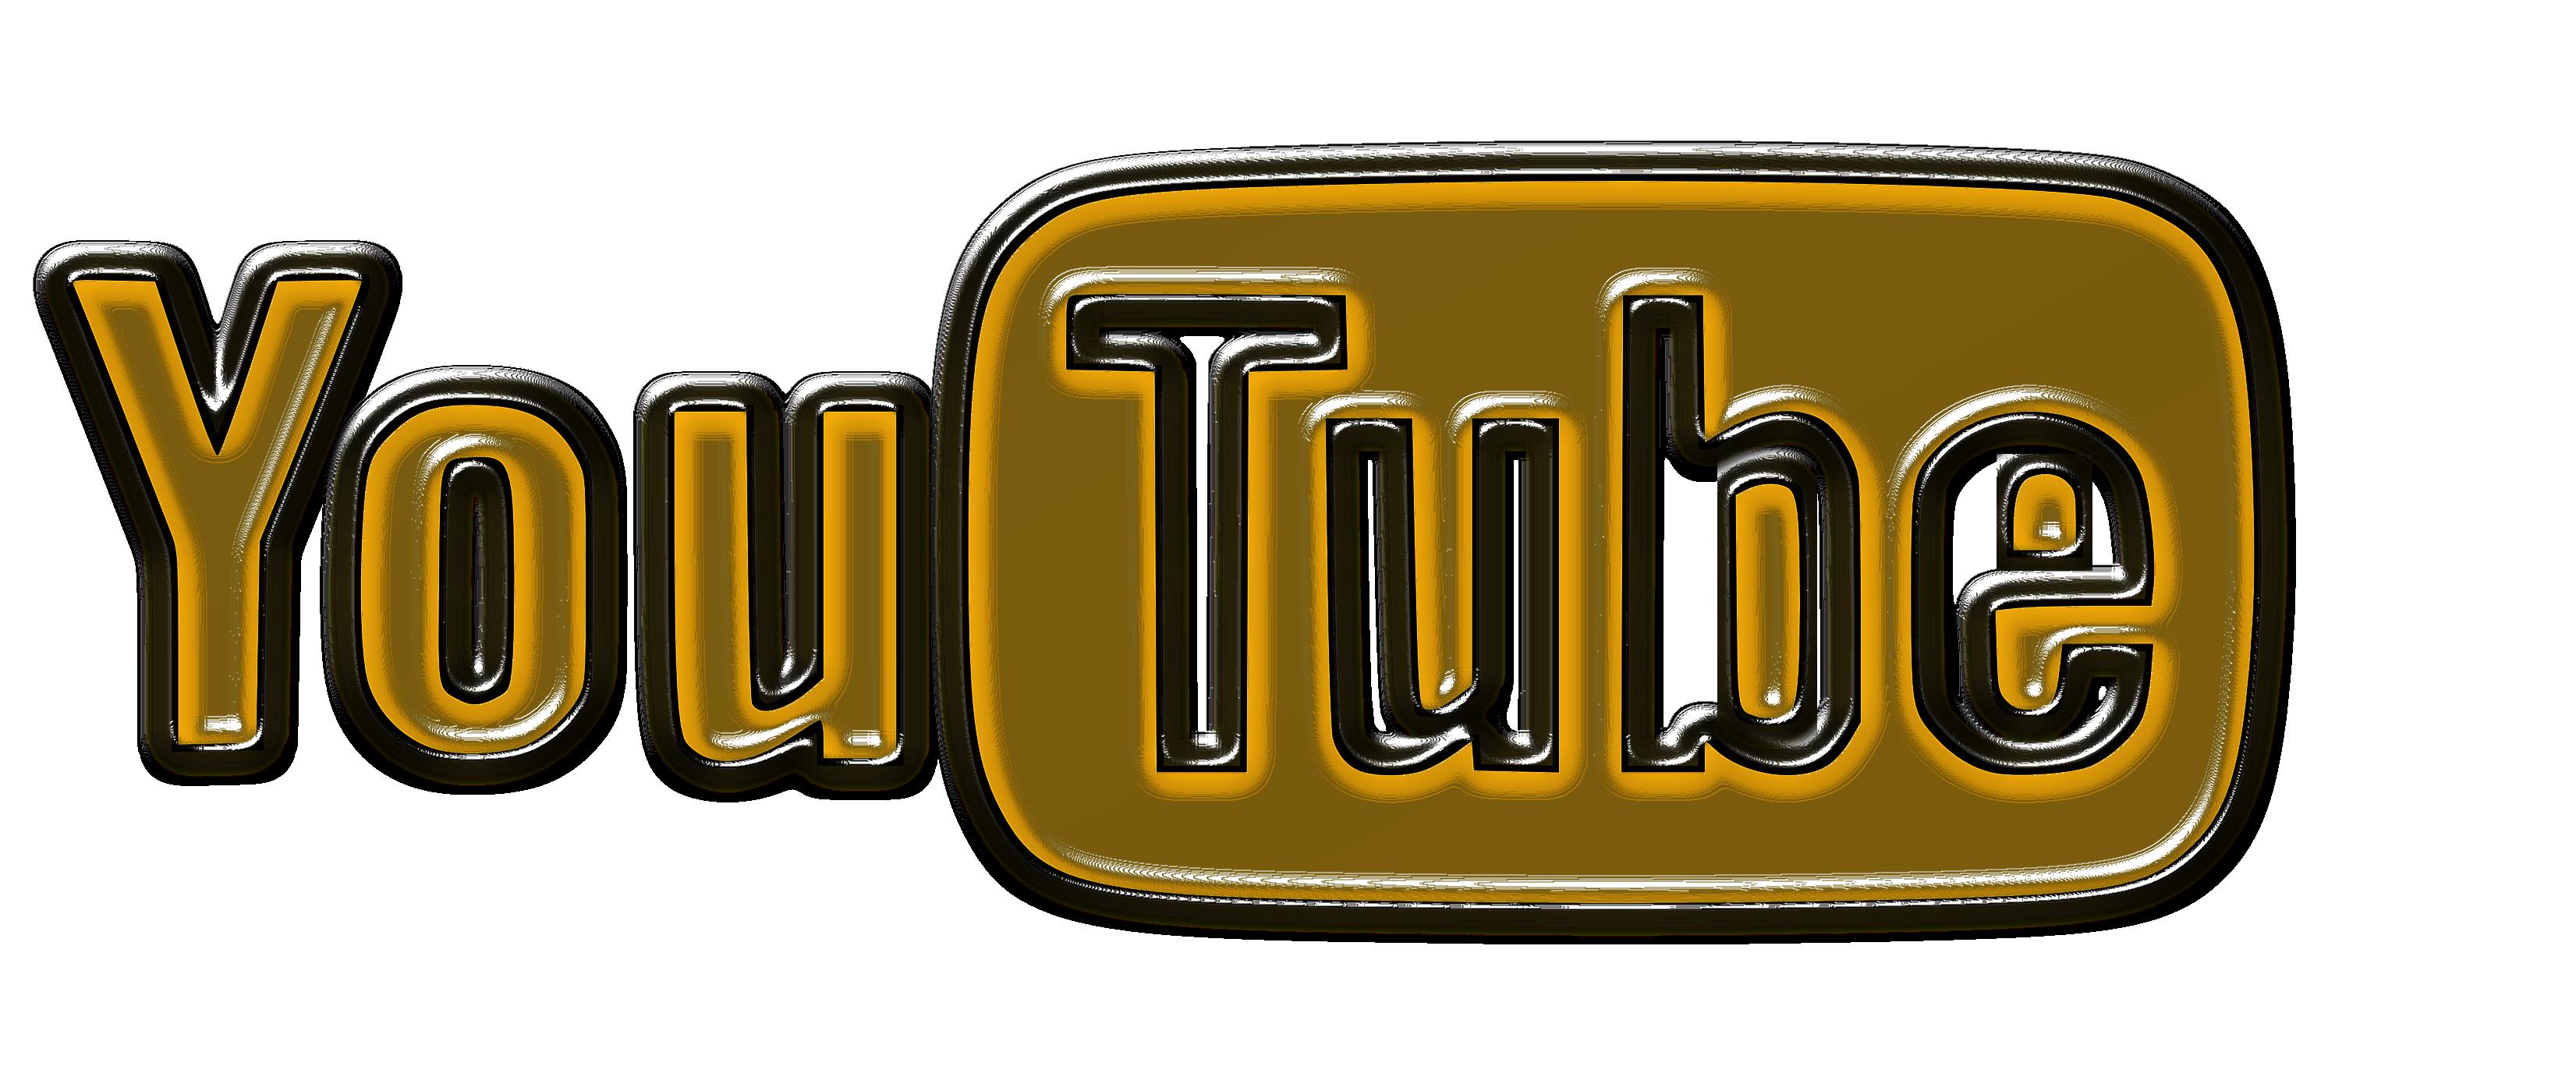 Golden and white logo of YouTube free image